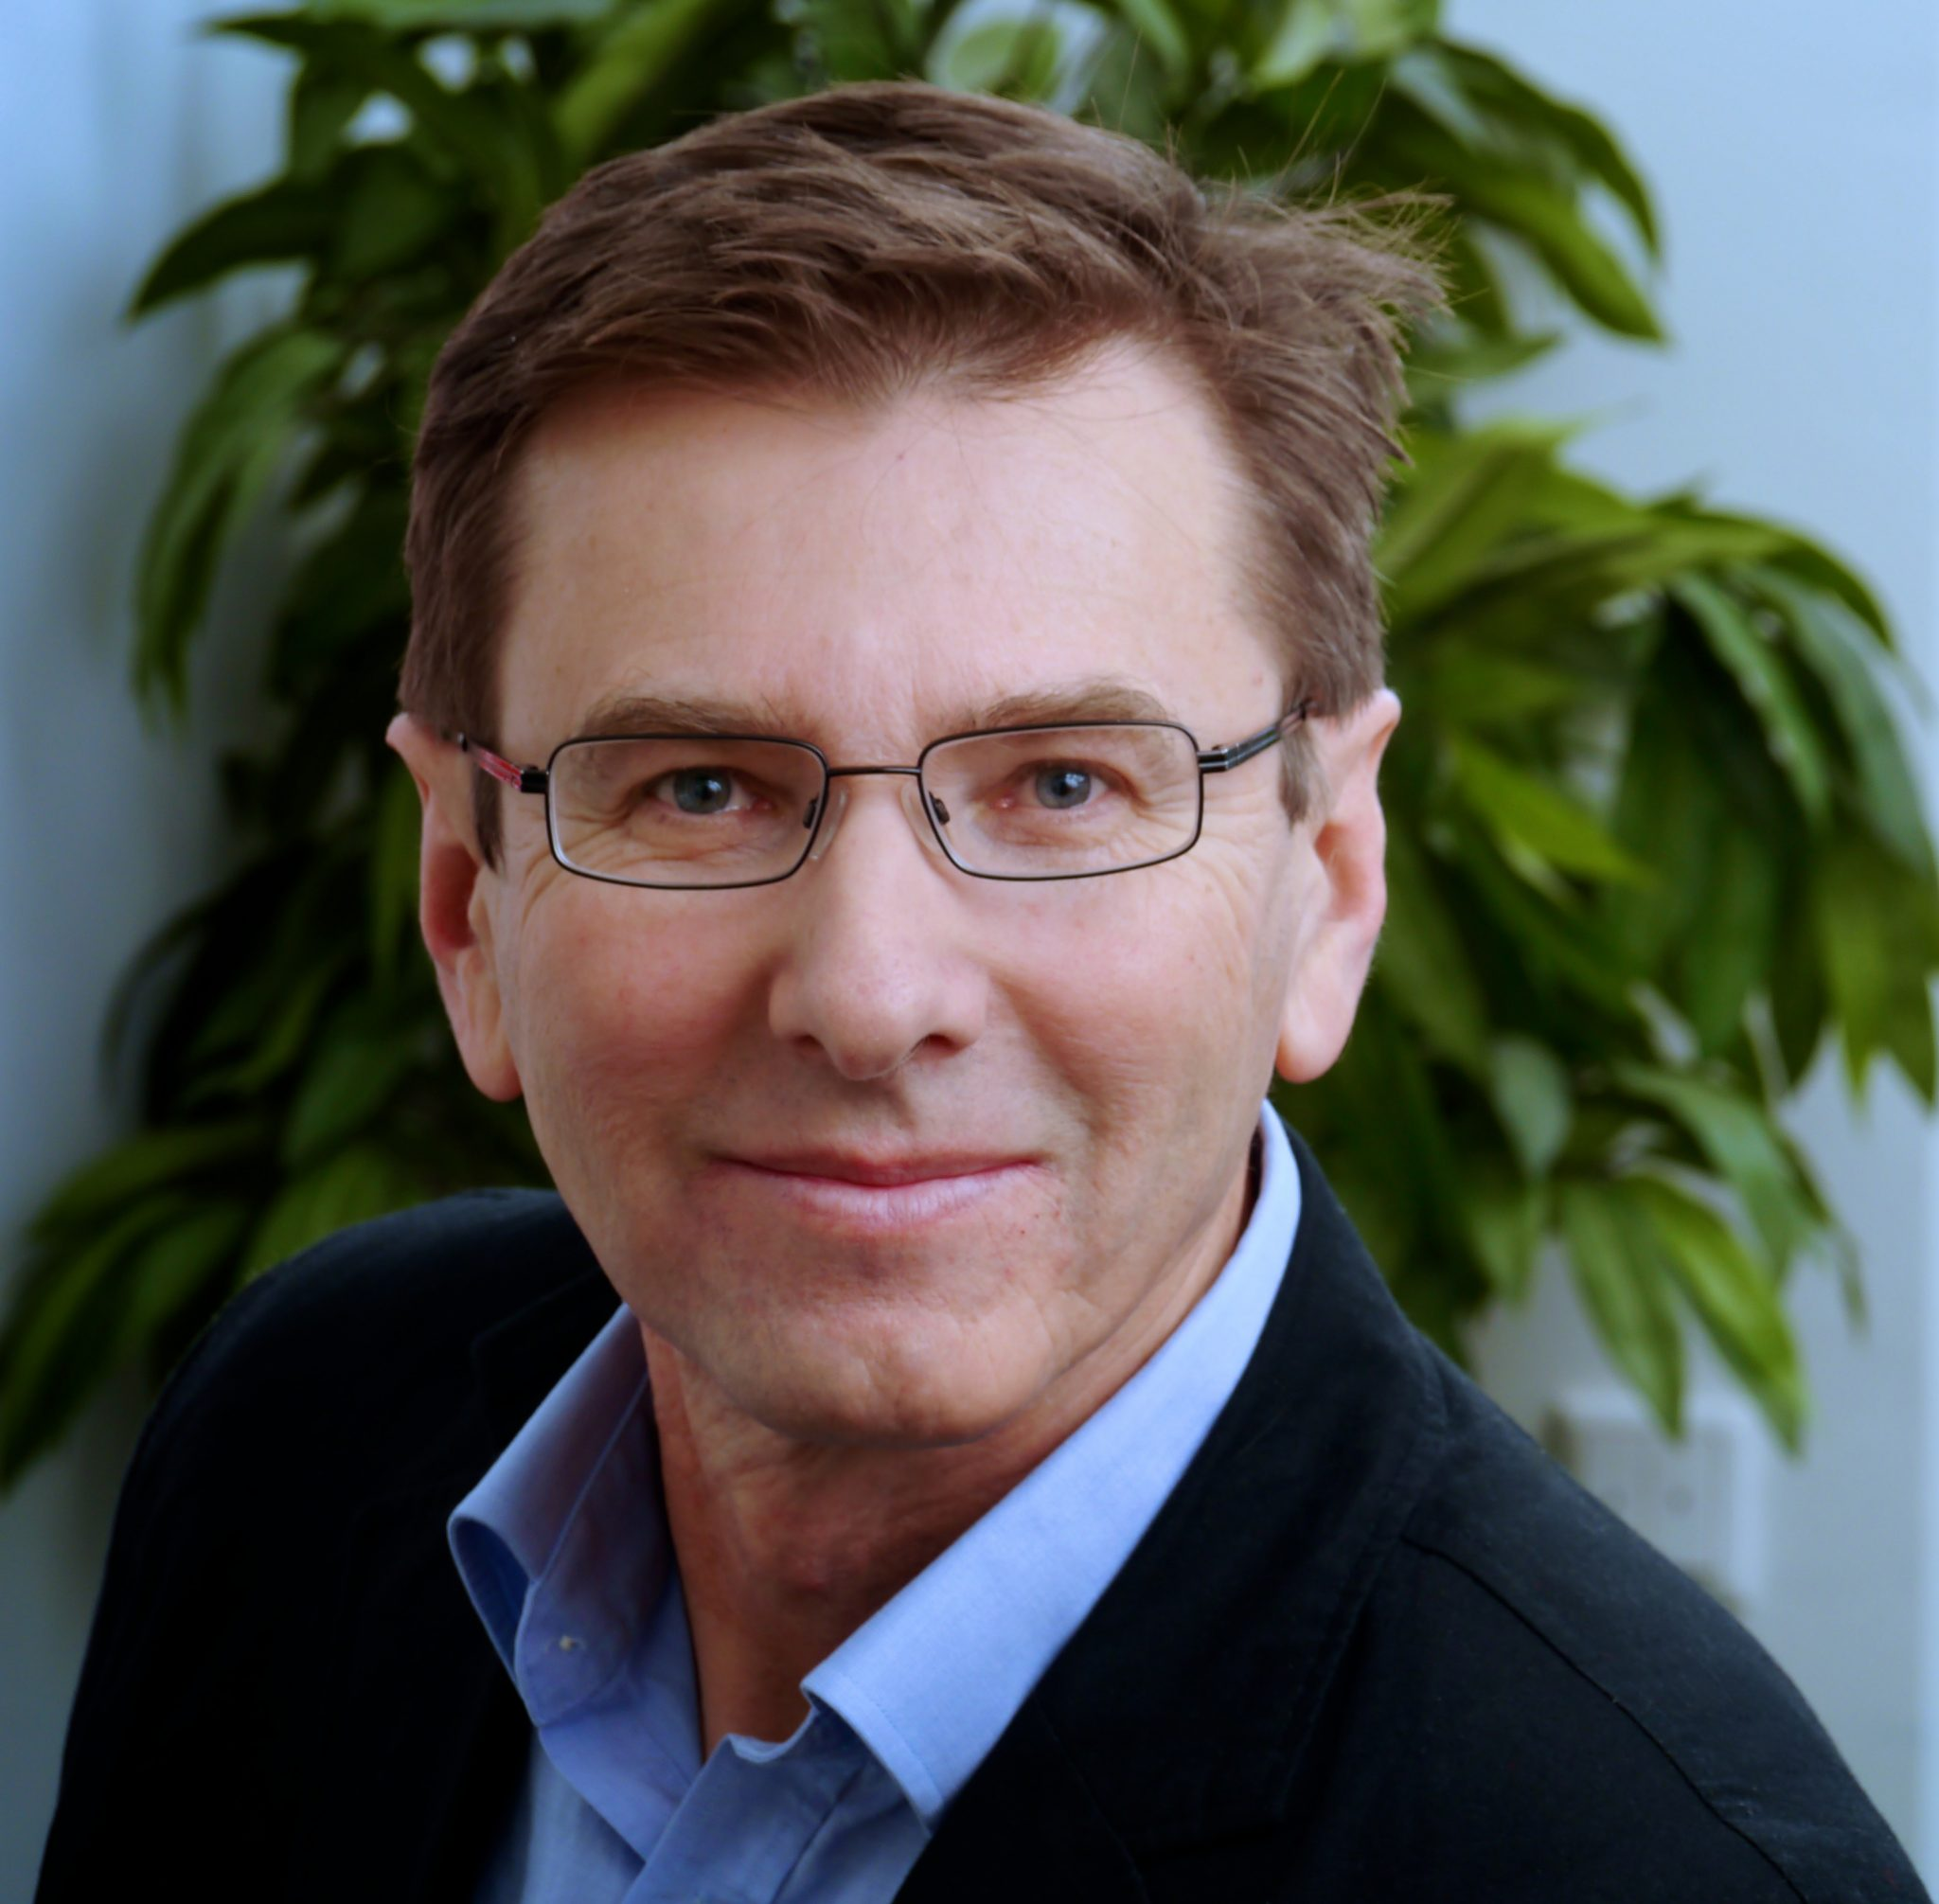 Dr. Klaus Manhart